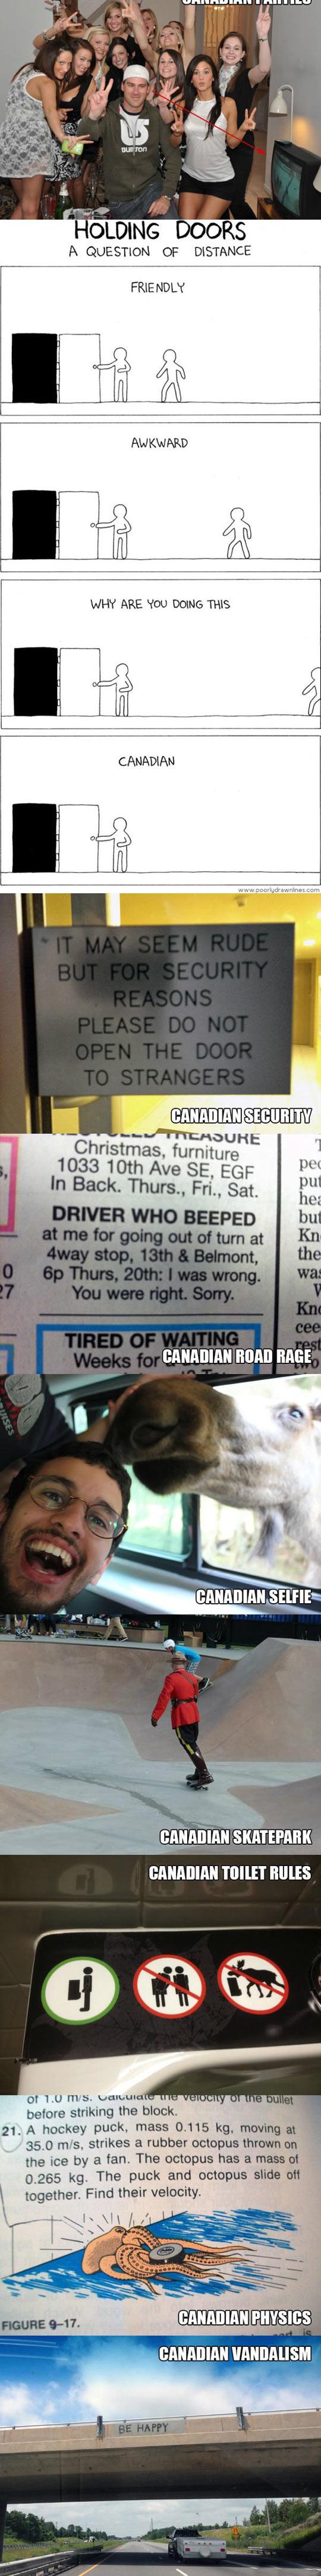 fakten-über-kanada 2